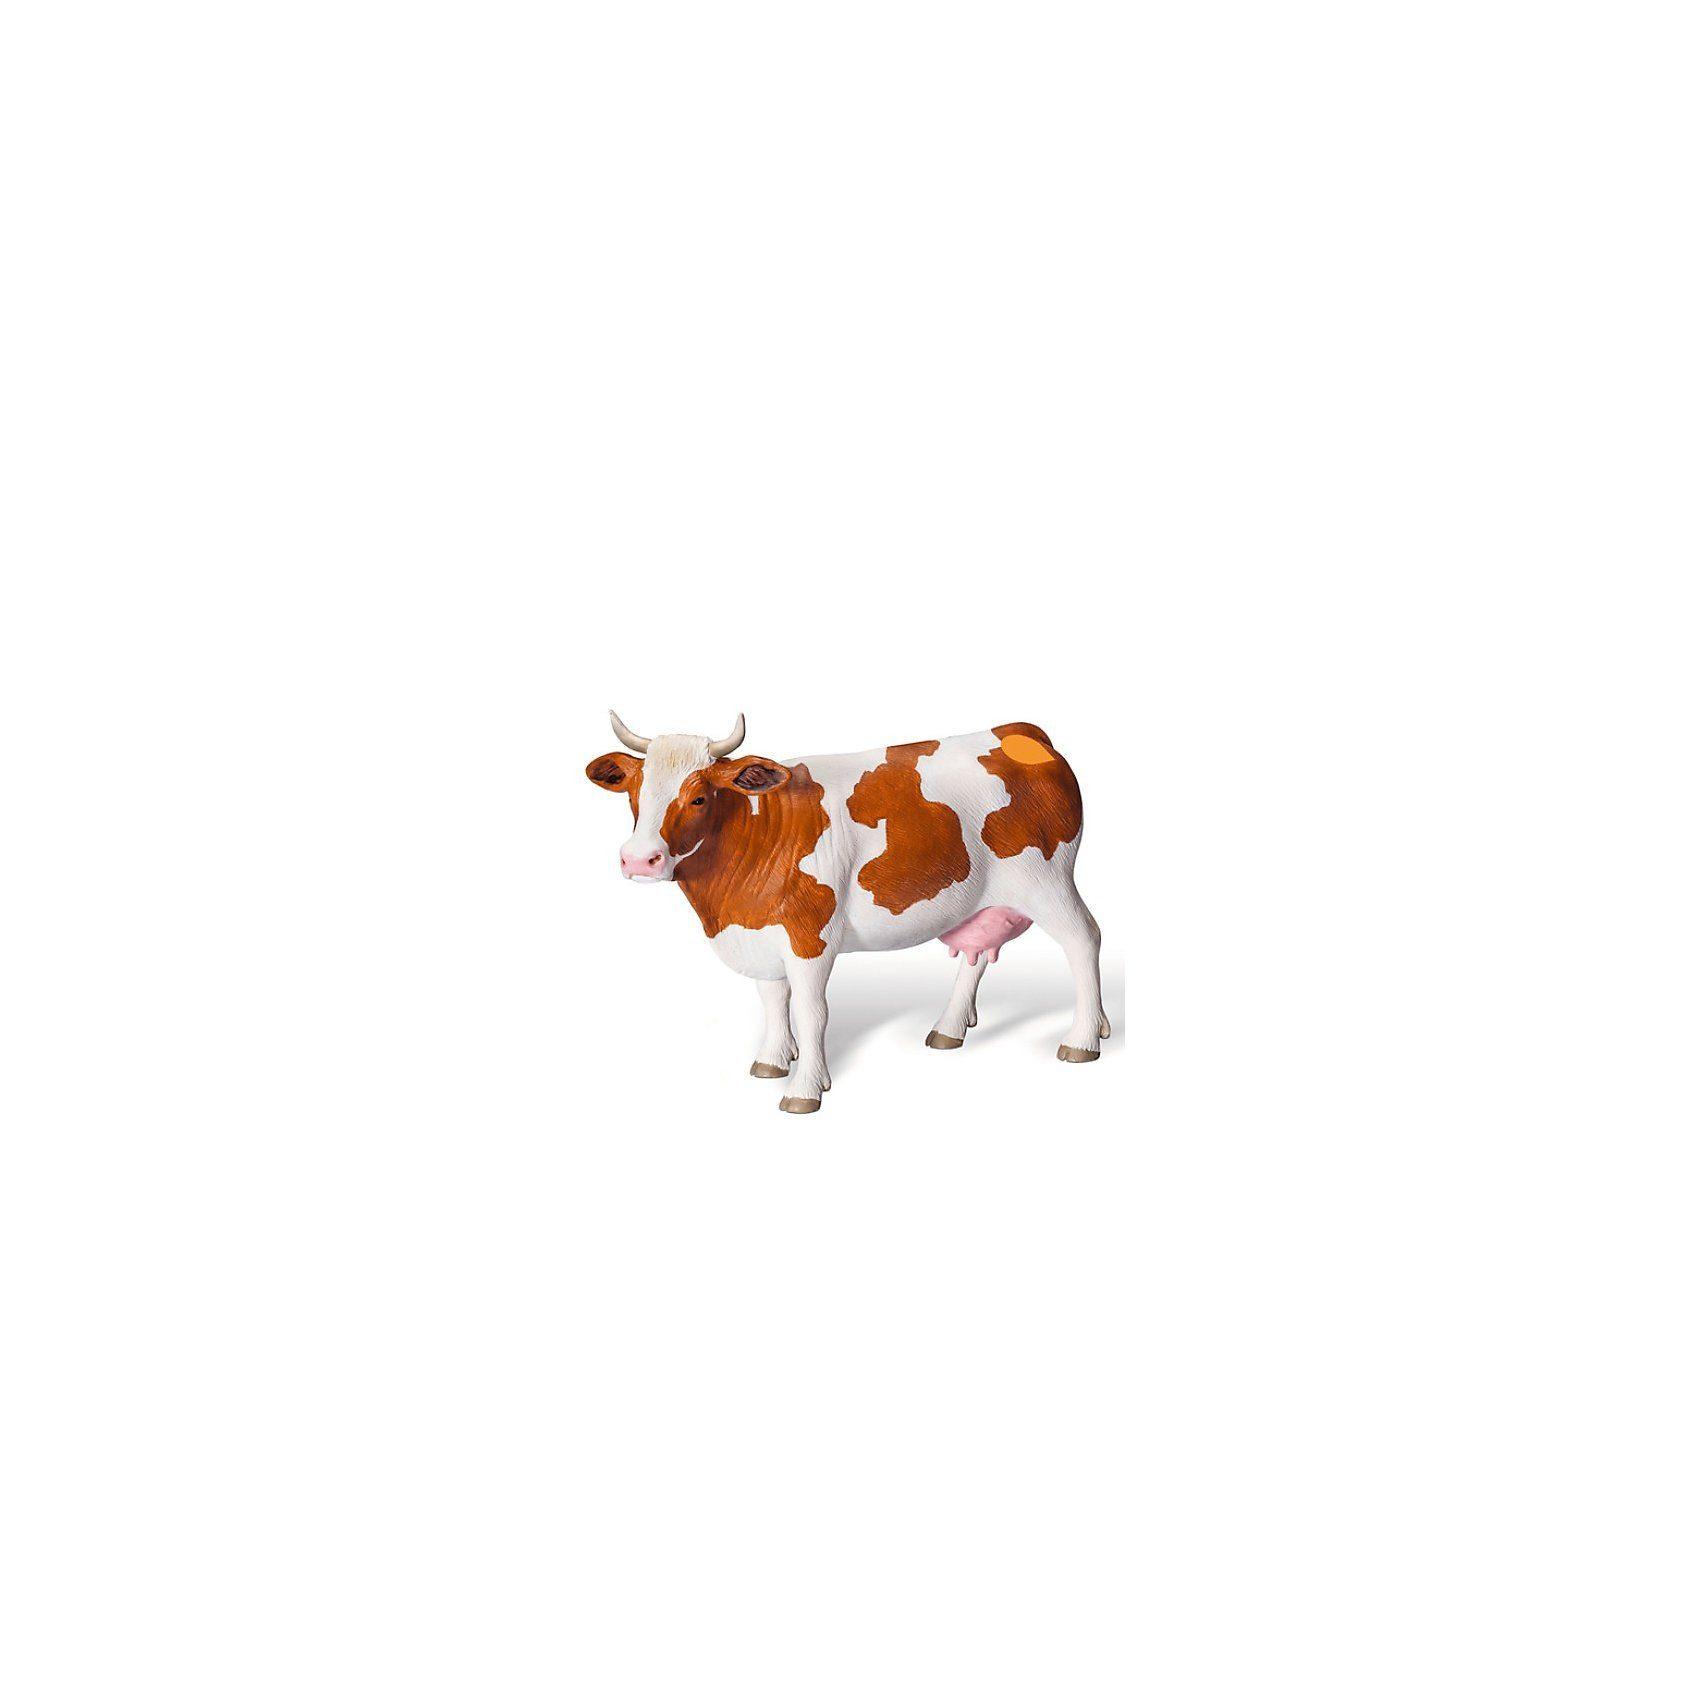 Ravensburger tiptoi® Spielfigur Fleckvieh-Kuh